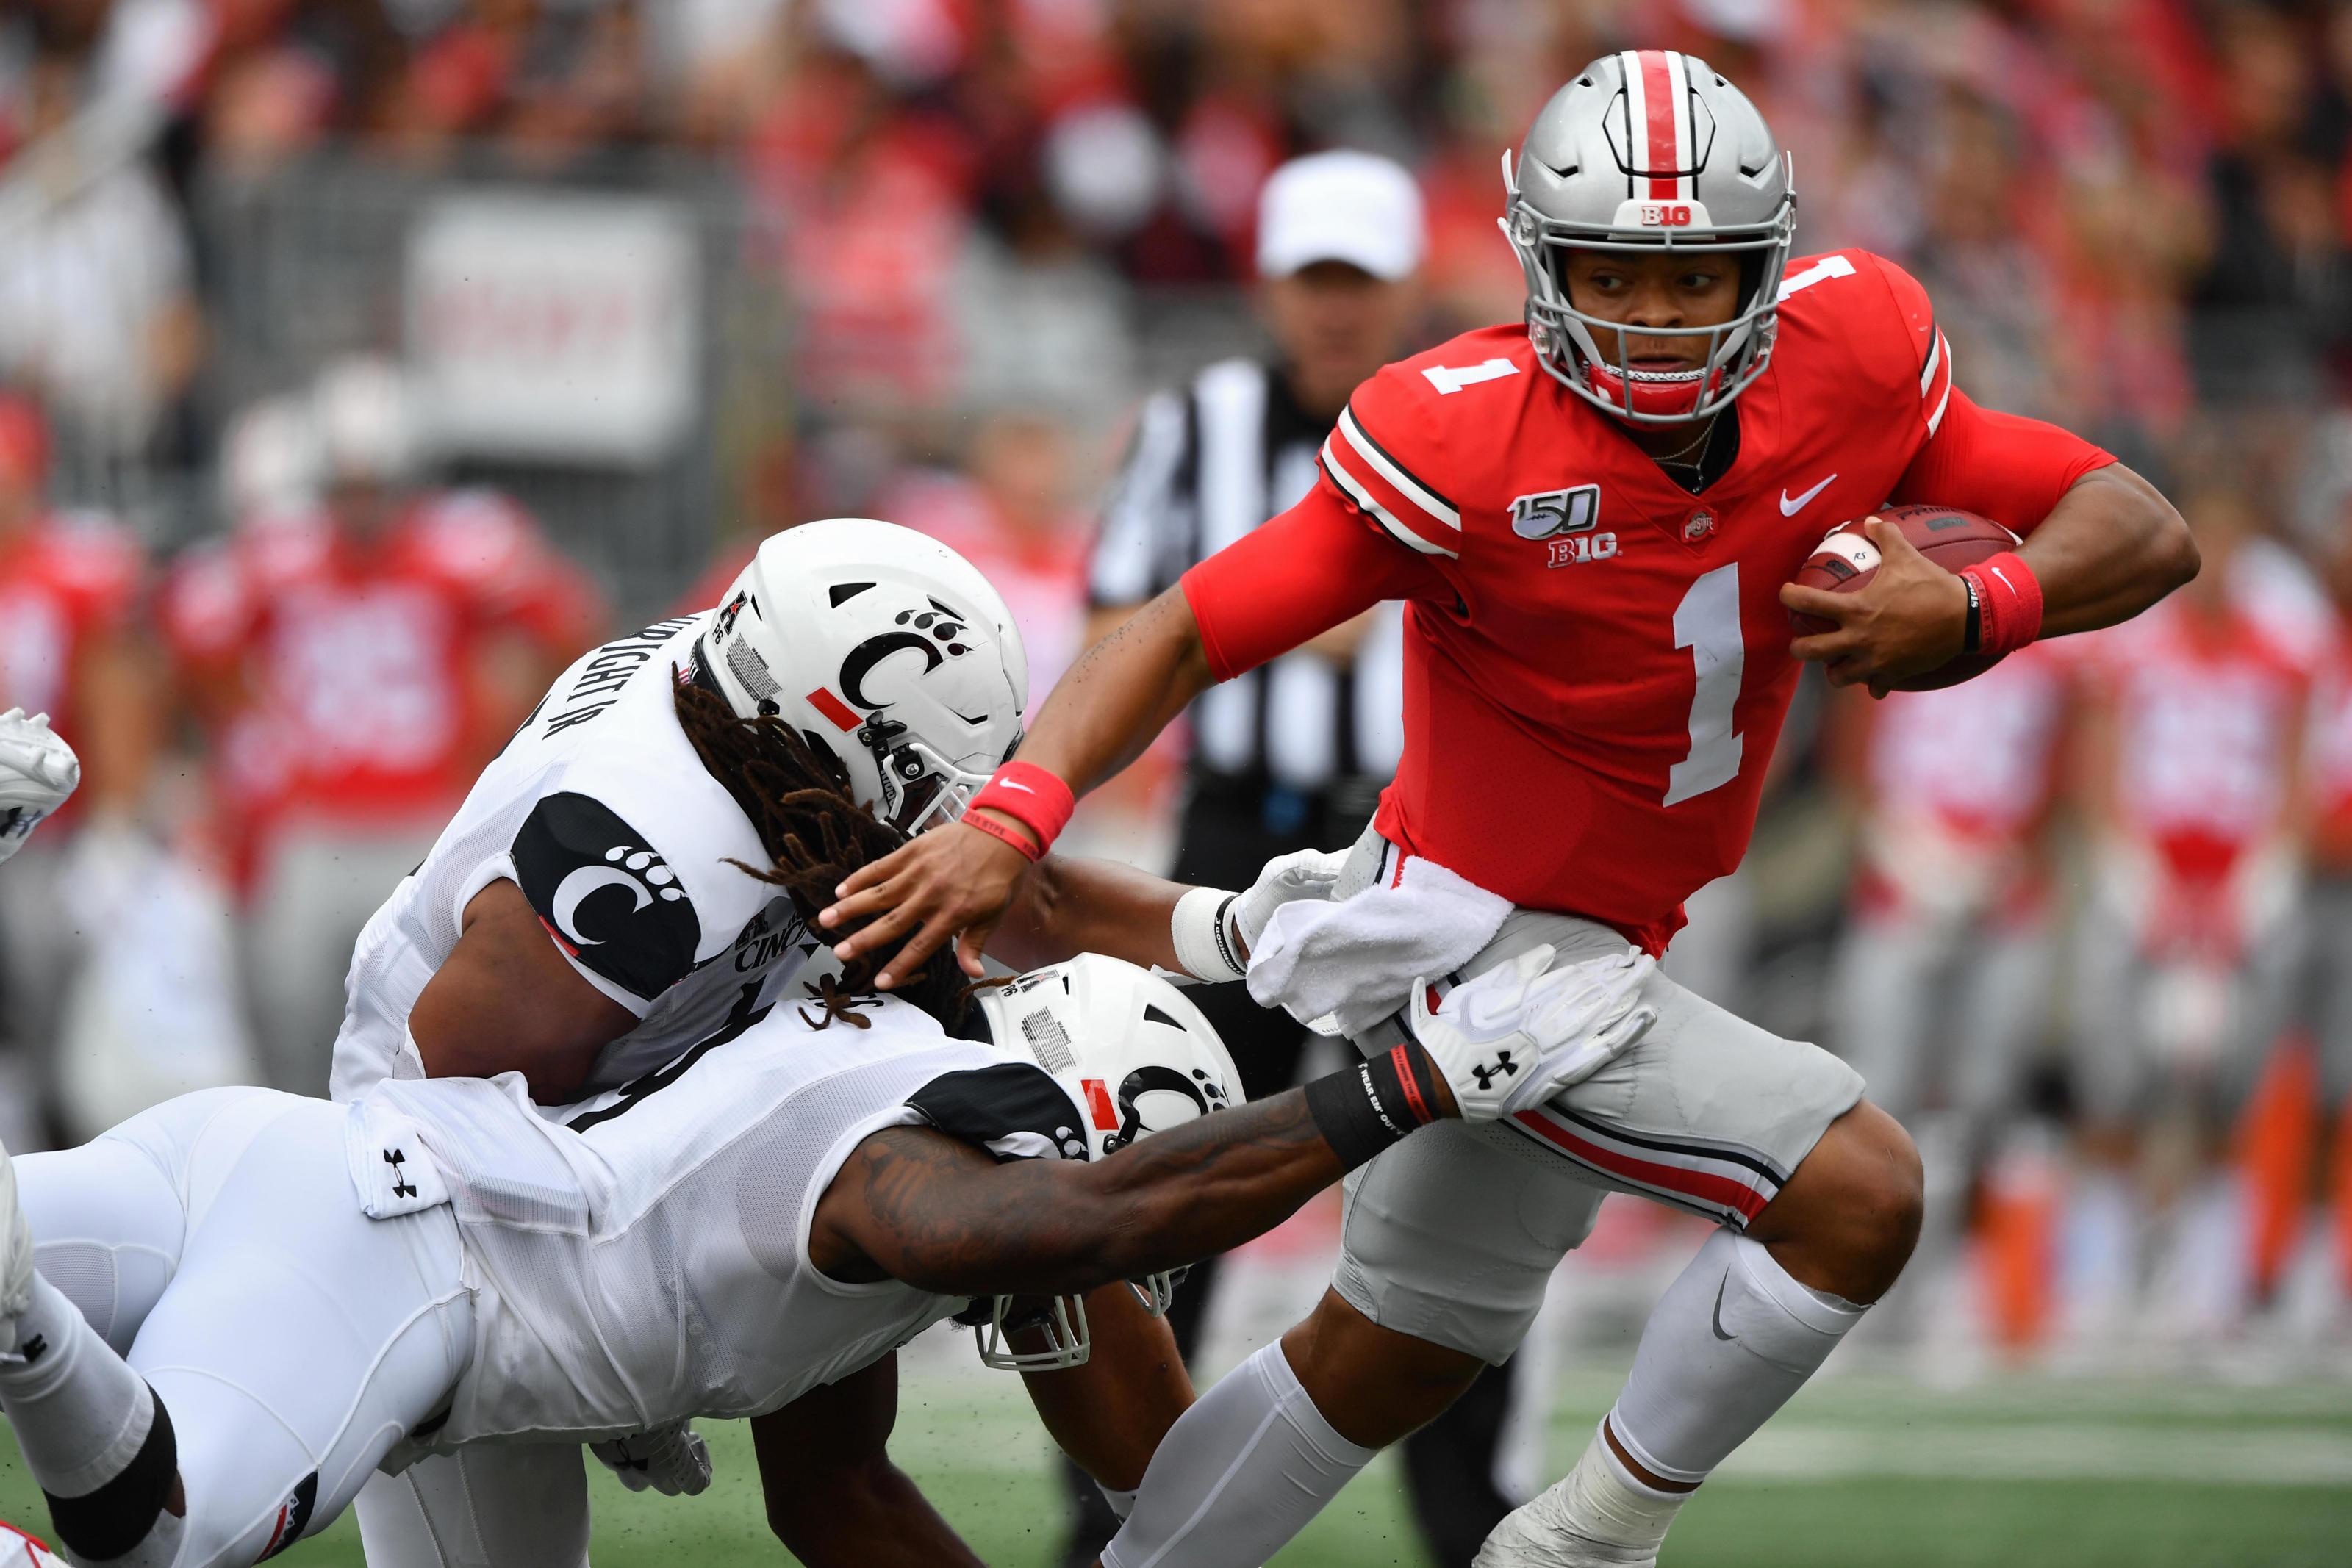 Ohio State Football: 3 reasons why Buckeyes will beat the ...